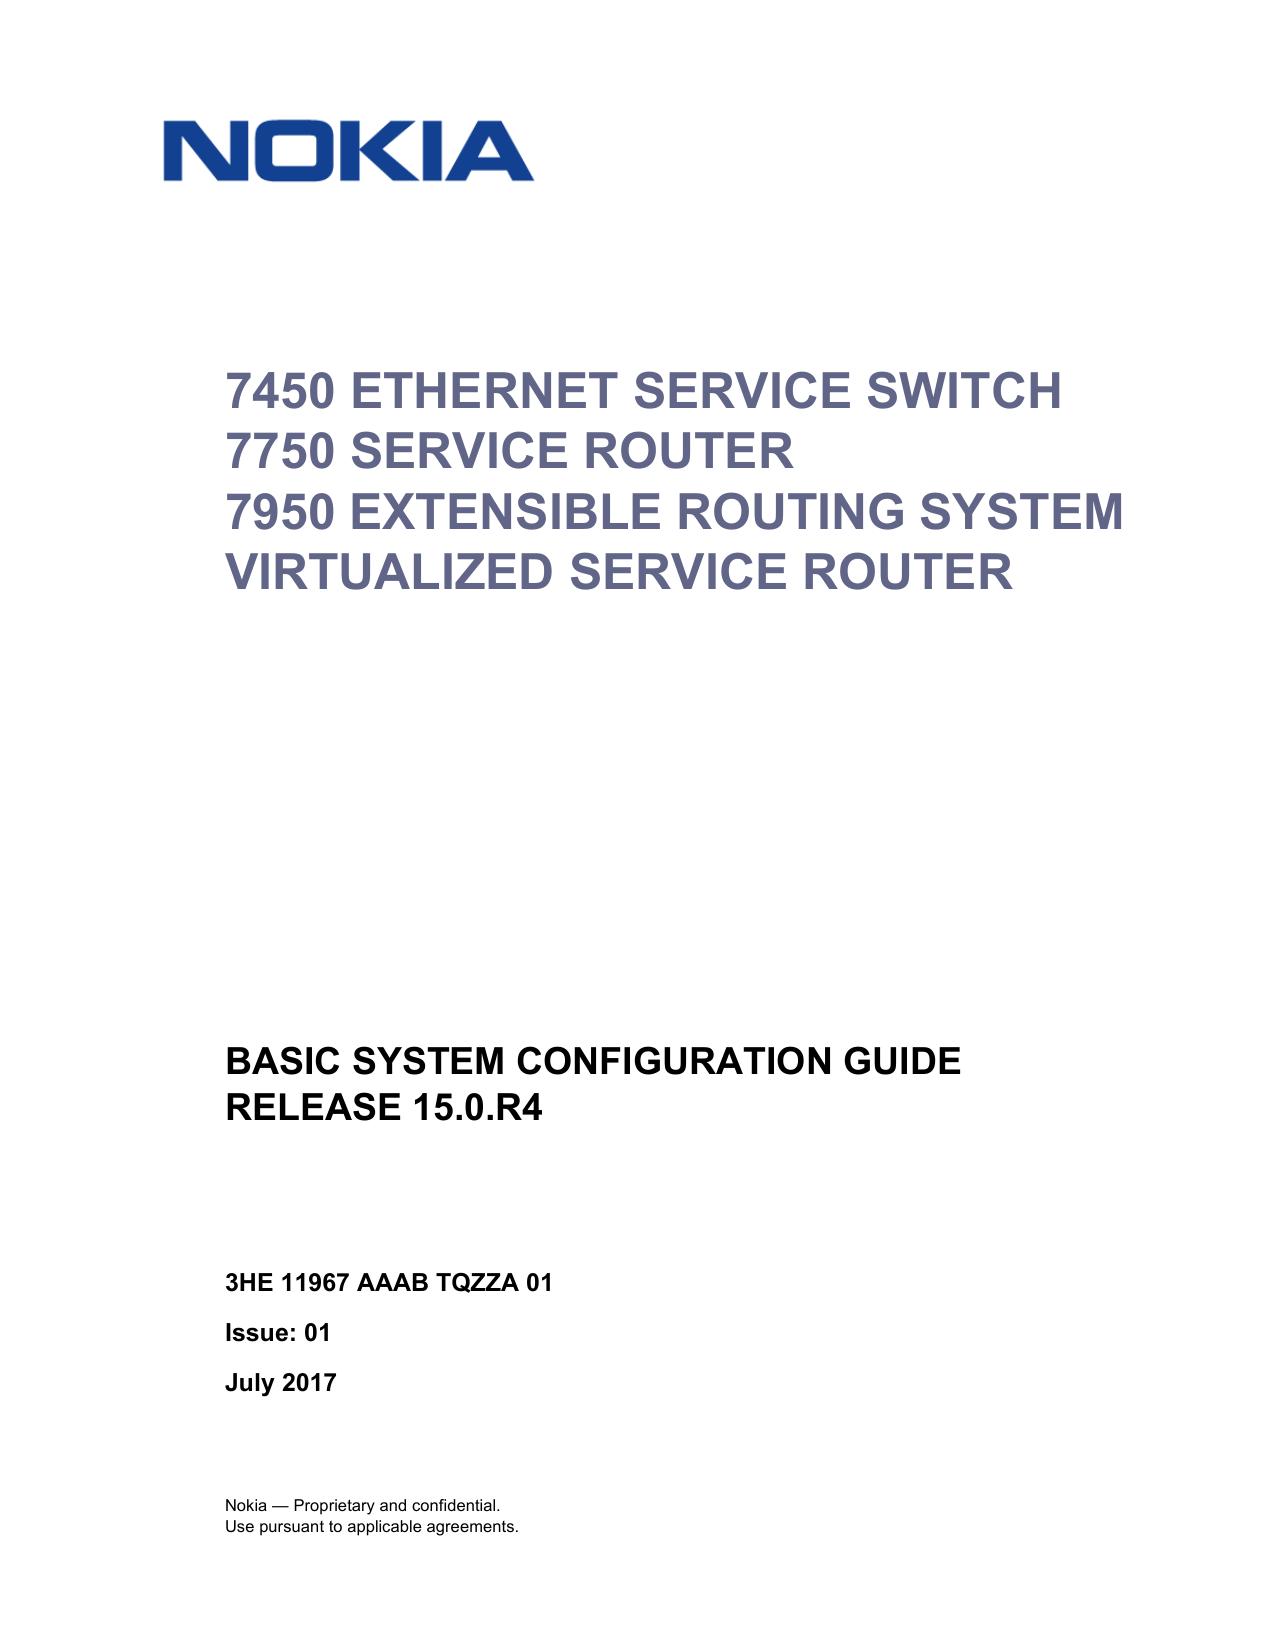 Basic System Configuration Guide R15 0 R4 - Alcatel   manualzz com